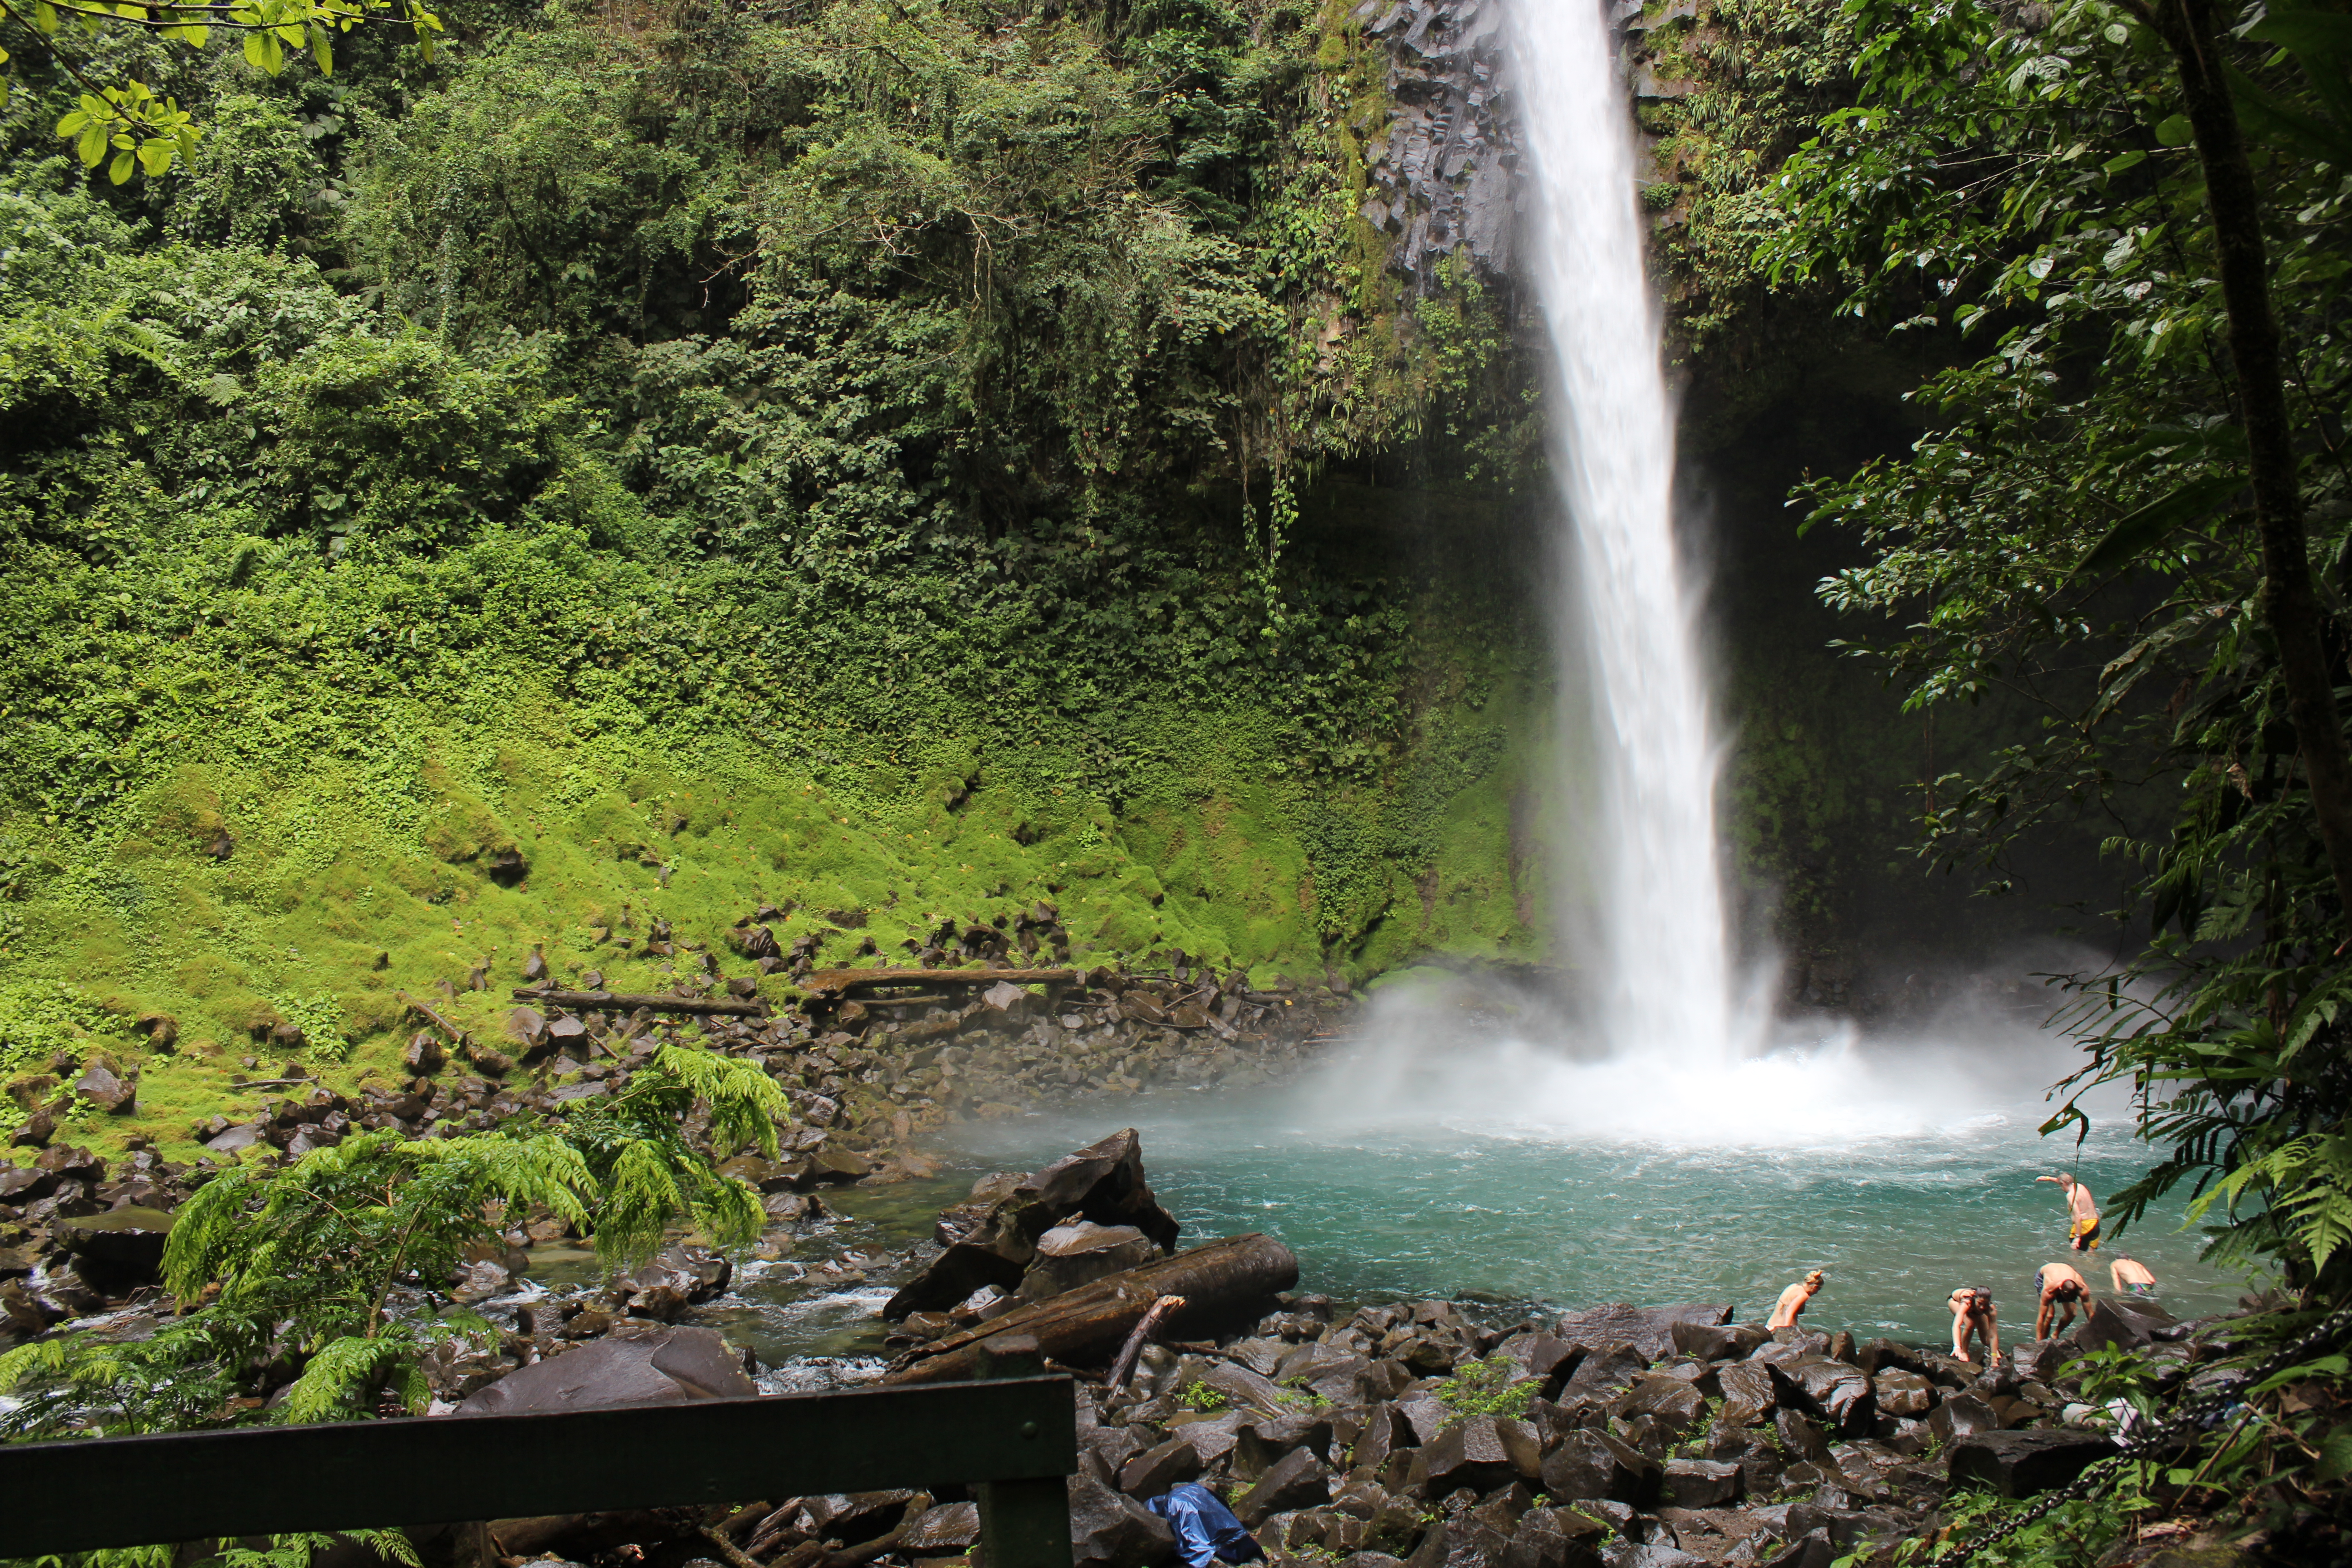 volc_waterfalls1